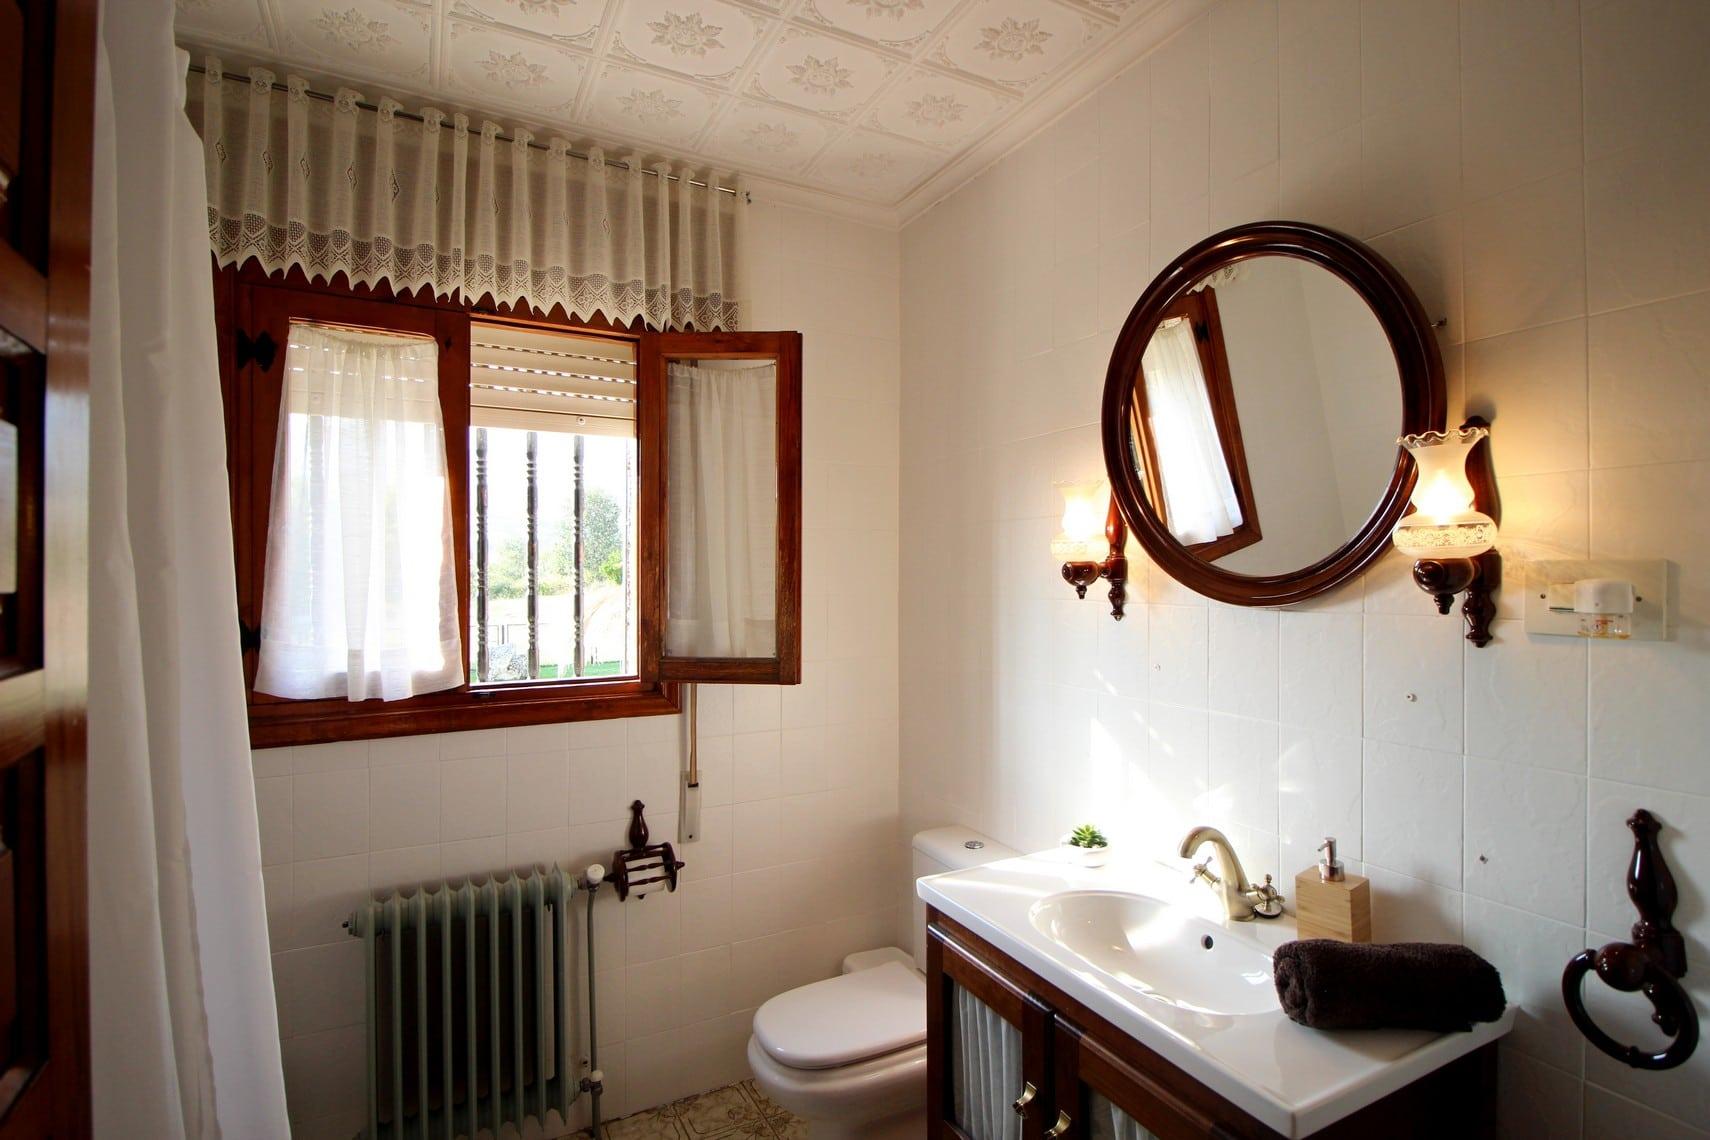 baño1_las_hazas_jarandilla0006